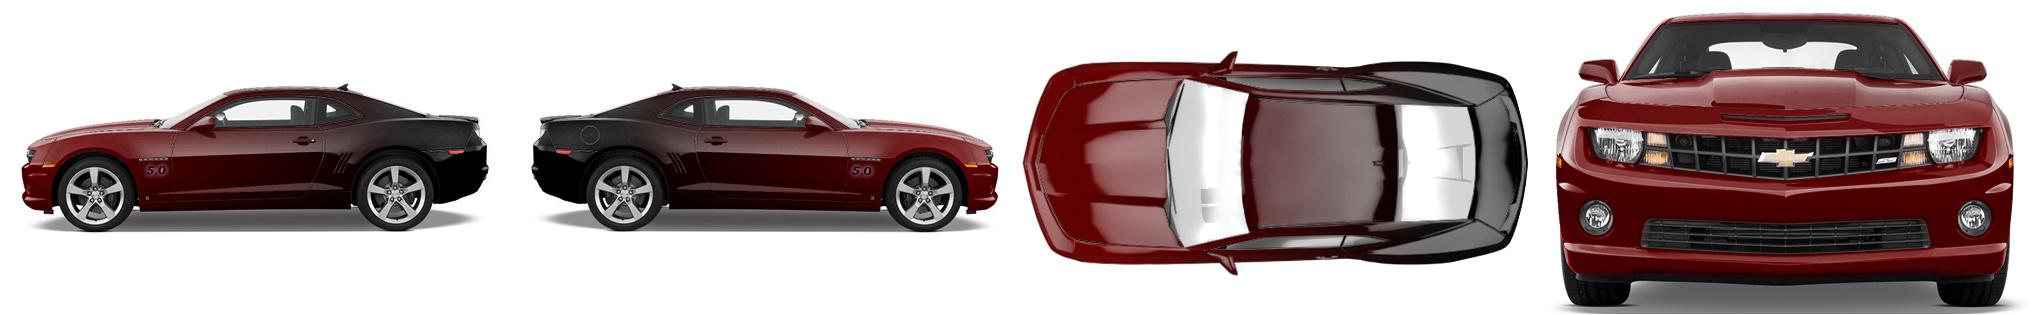 Muscle Car Wrap #977